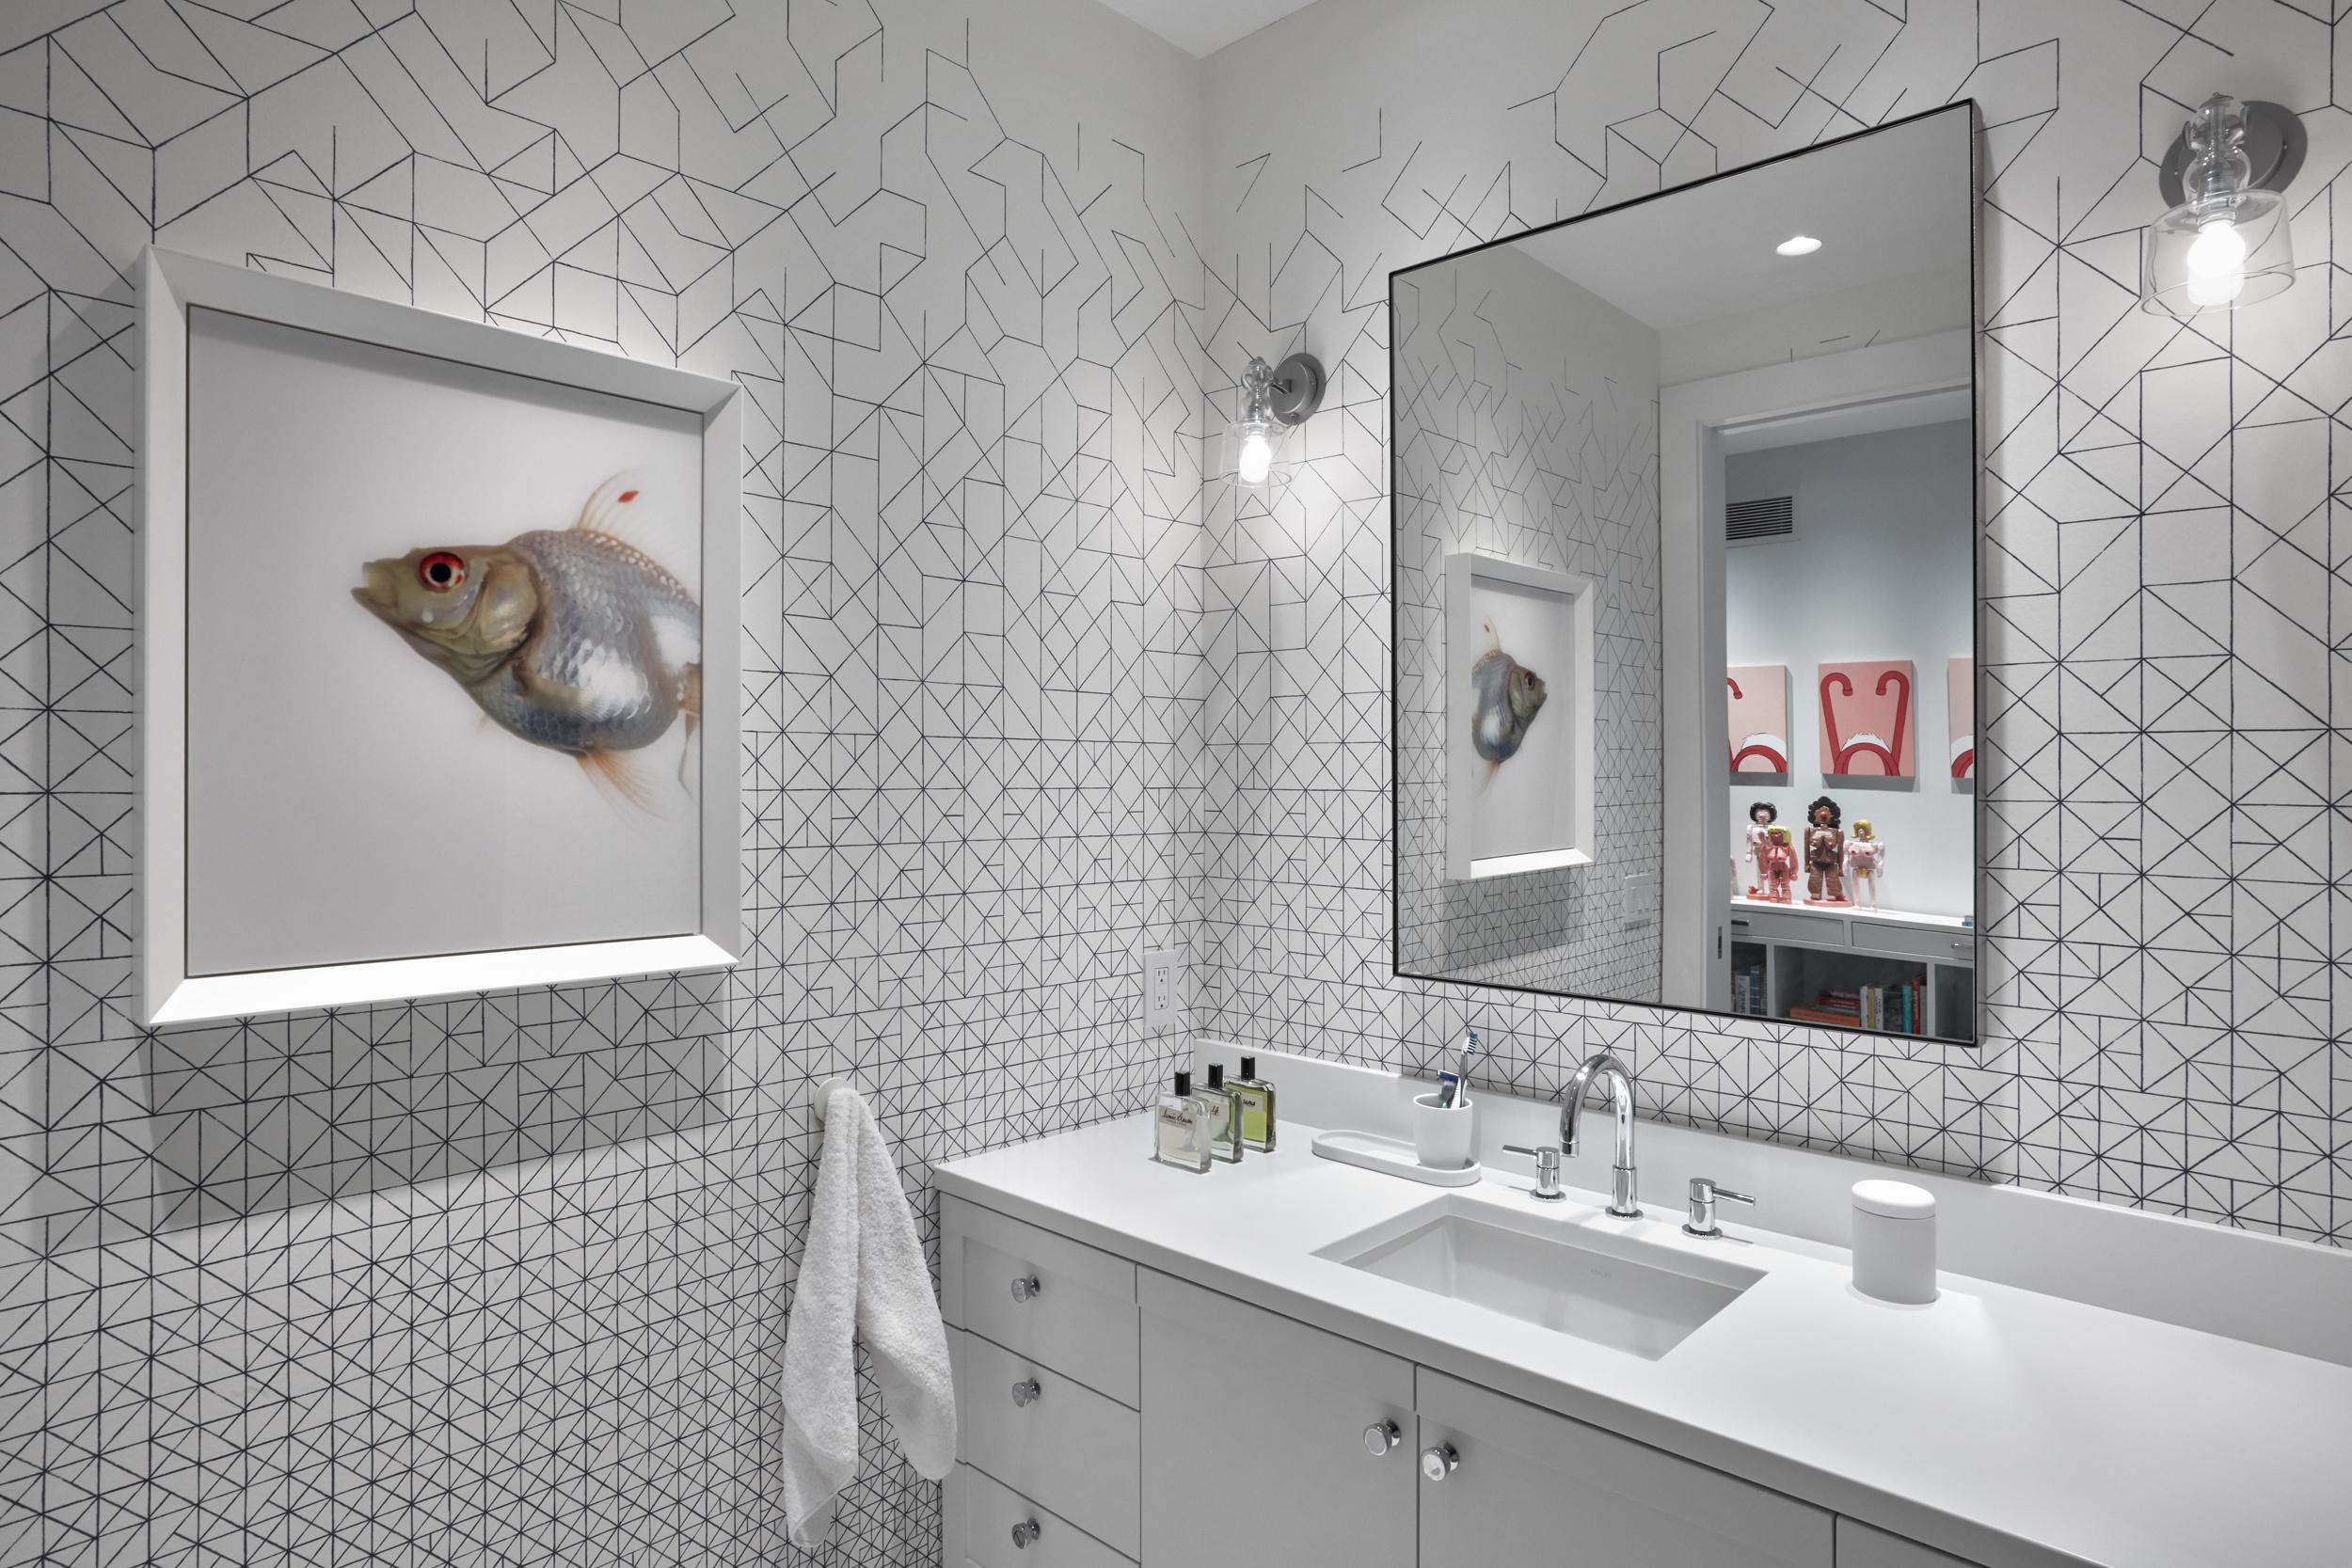 © ghislaine vinas interior design_montauk_bathroom_fish.jpg